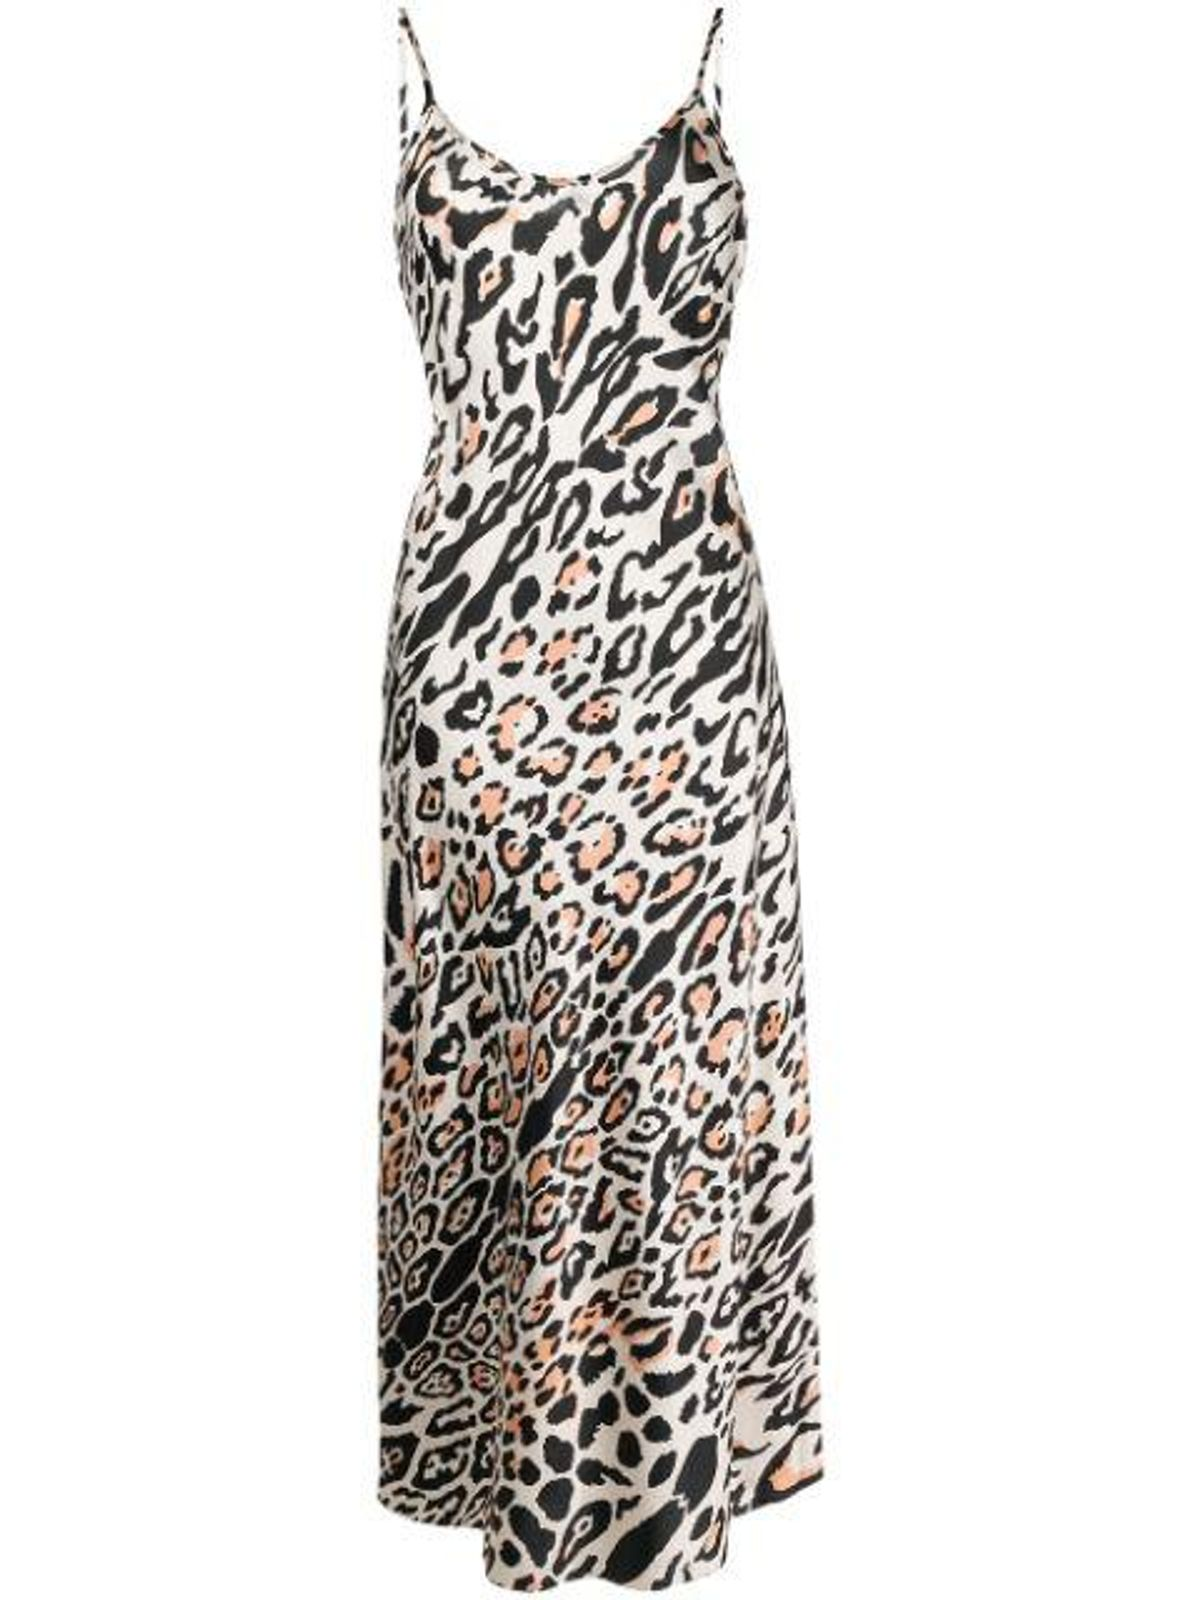 Elpis Silk-Blend Slip Dress